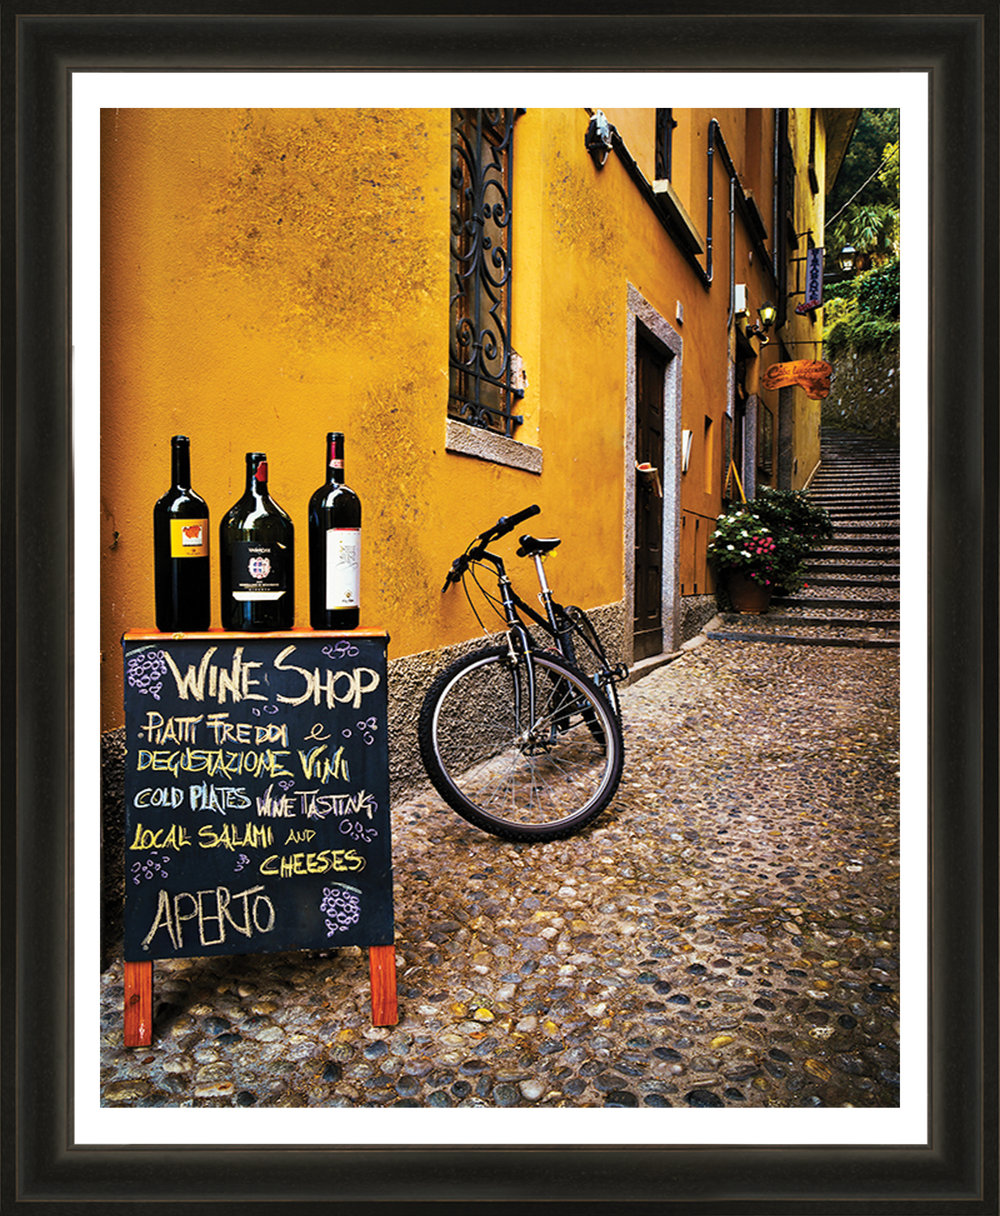 Wine-Shop.jpg